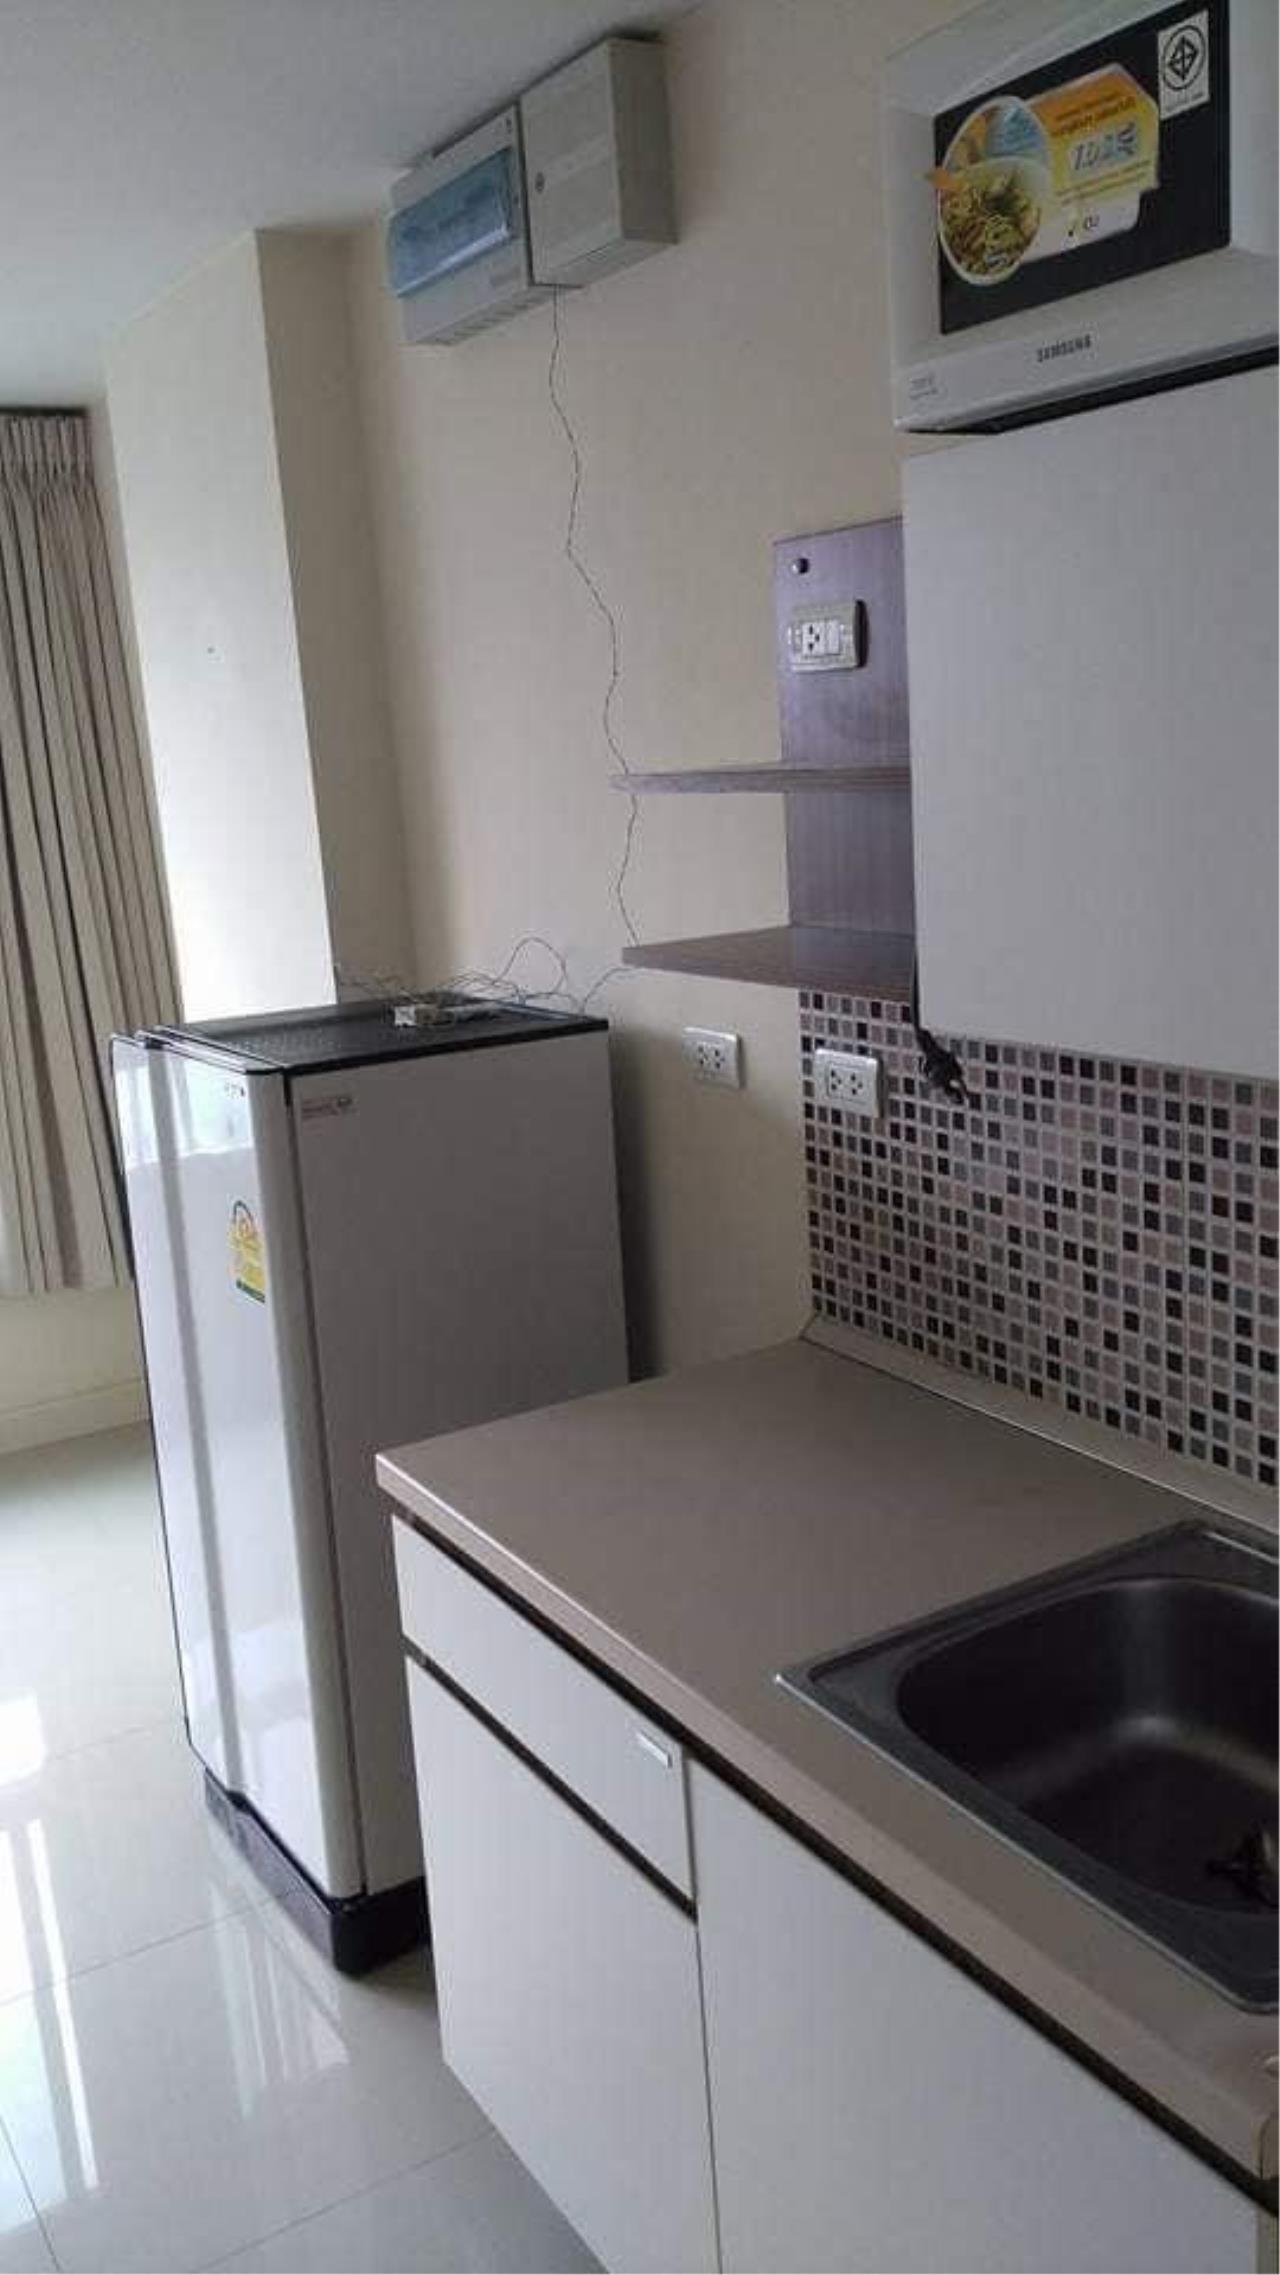 Agent - Phapayawarin Agency's Wish @ Siam for Rent, 1 Bedroom 1 Bathroom, 36 Sq.m., BTS Ratchathewi 5